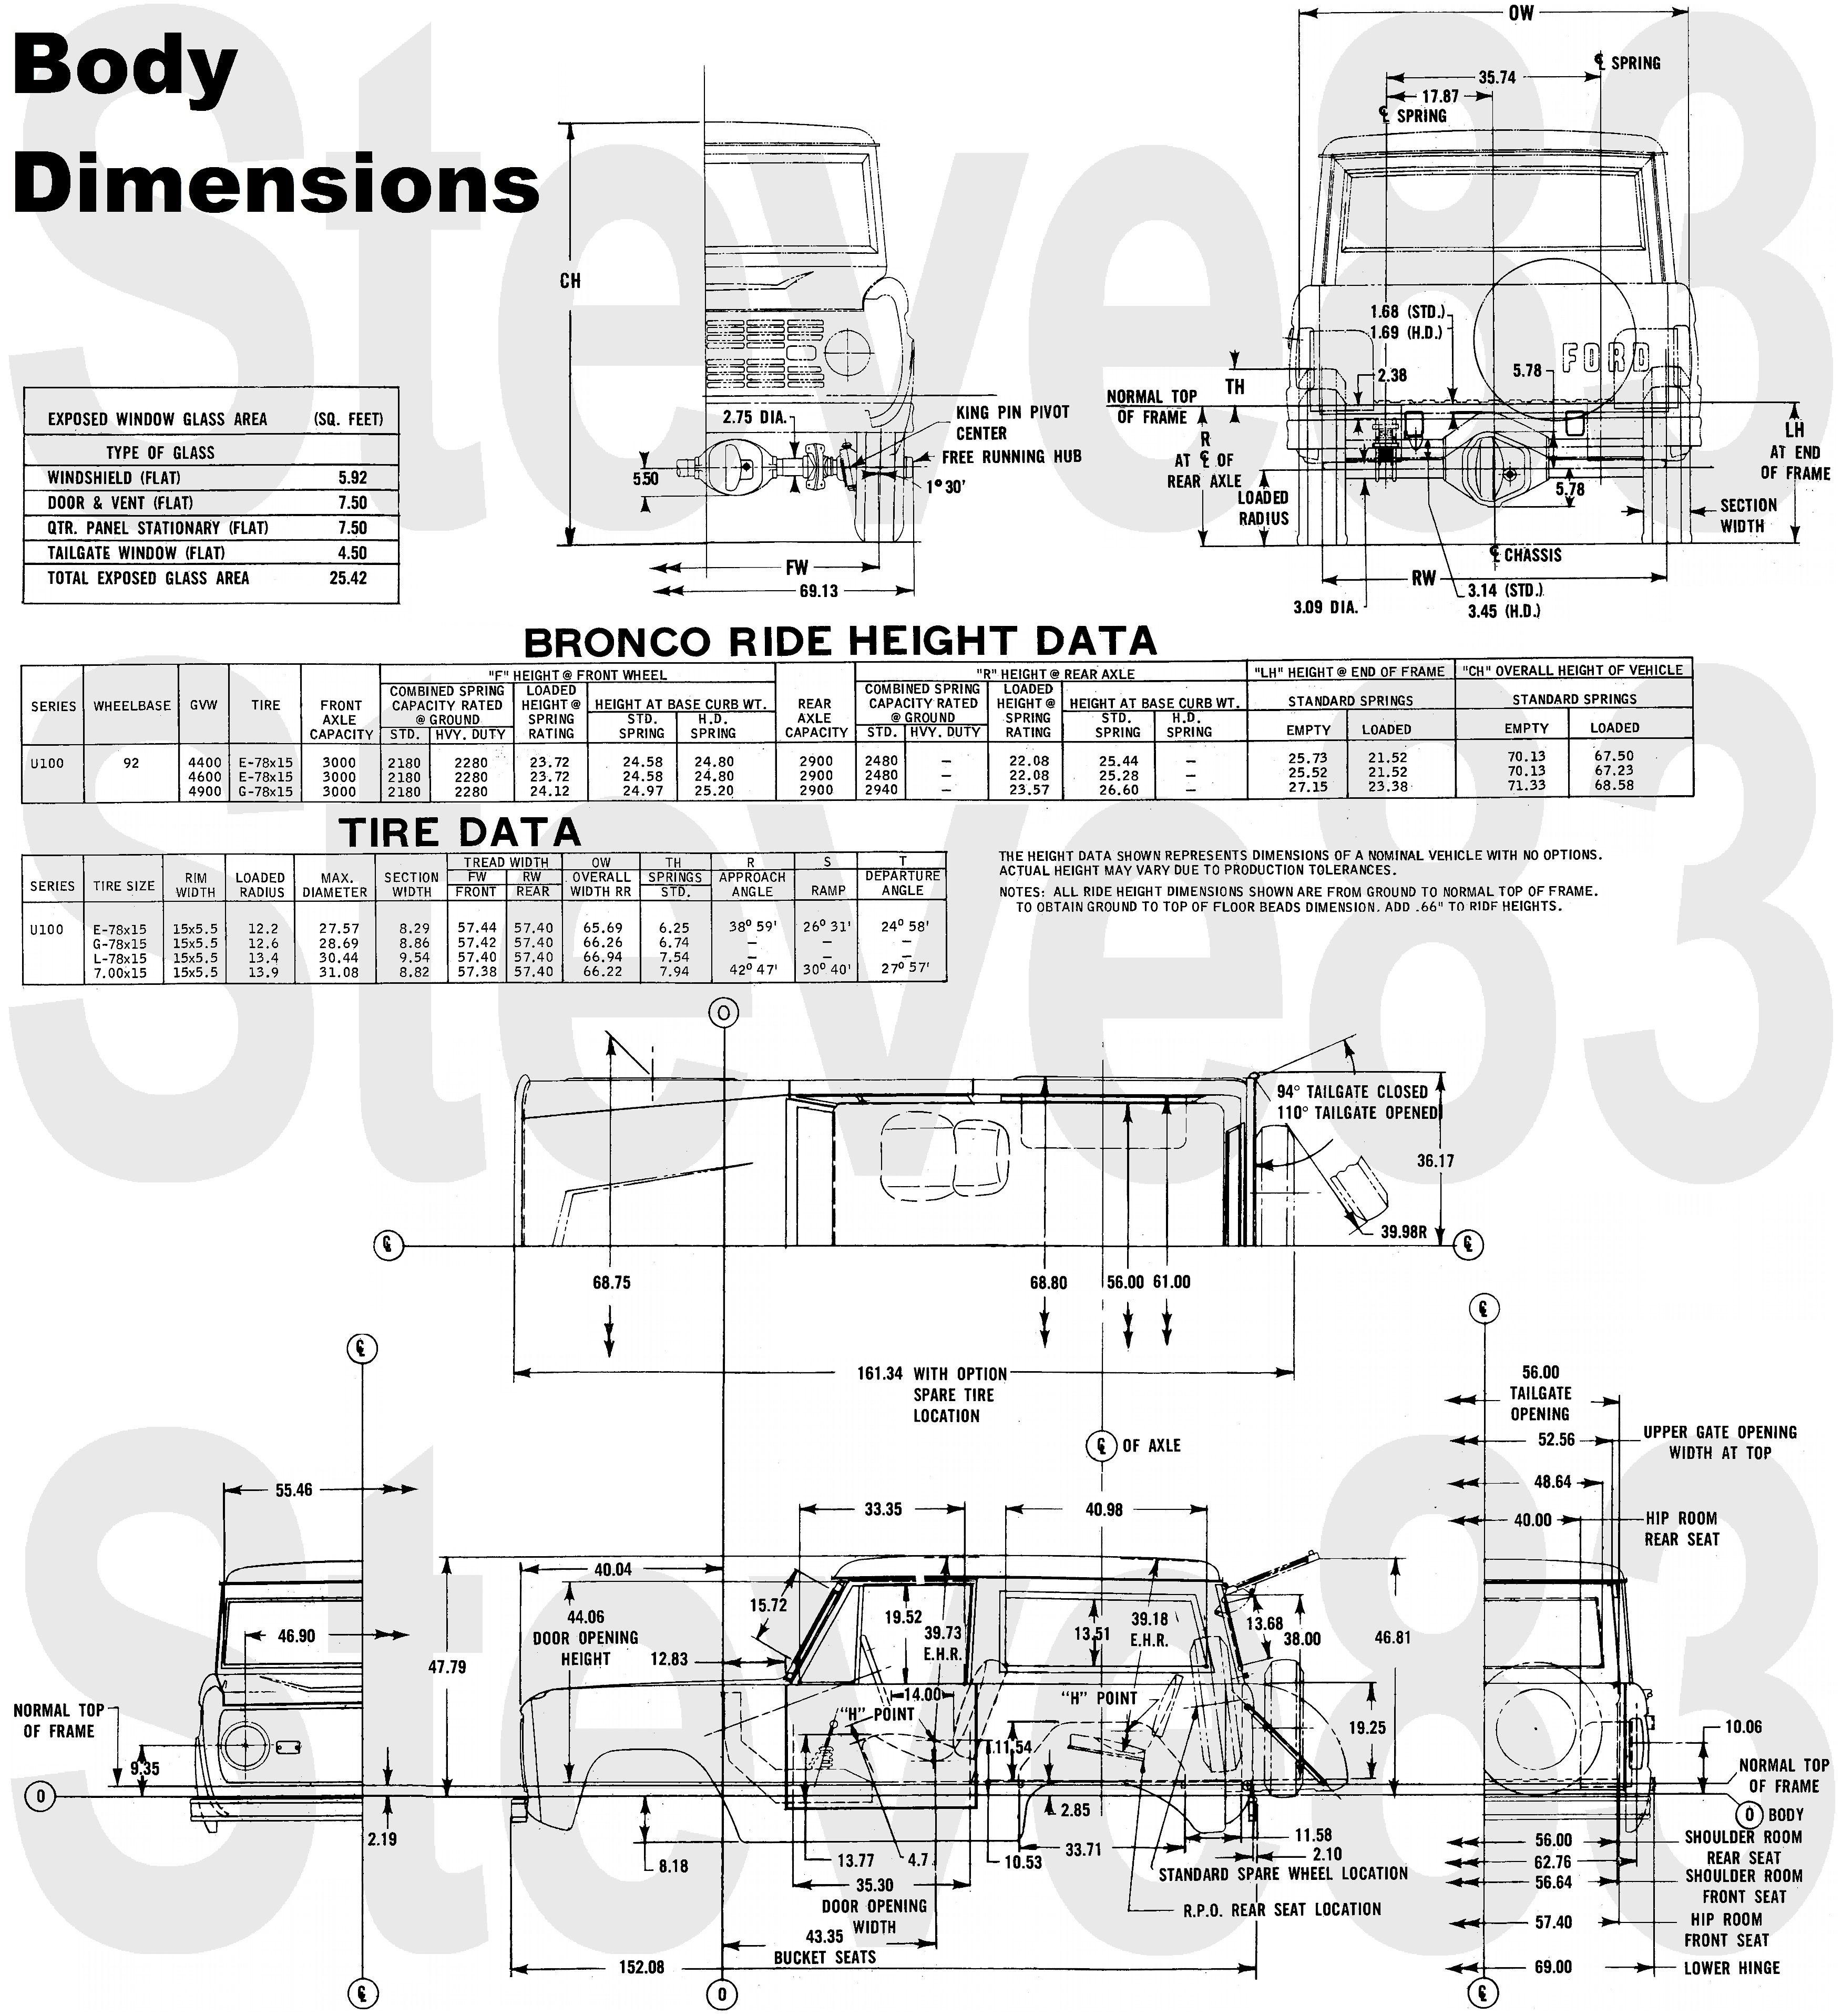 hight resolution of ford bronco frame diagram basic guide wiring diagram u2022 1974 ford bronco 302 vacuum diagram